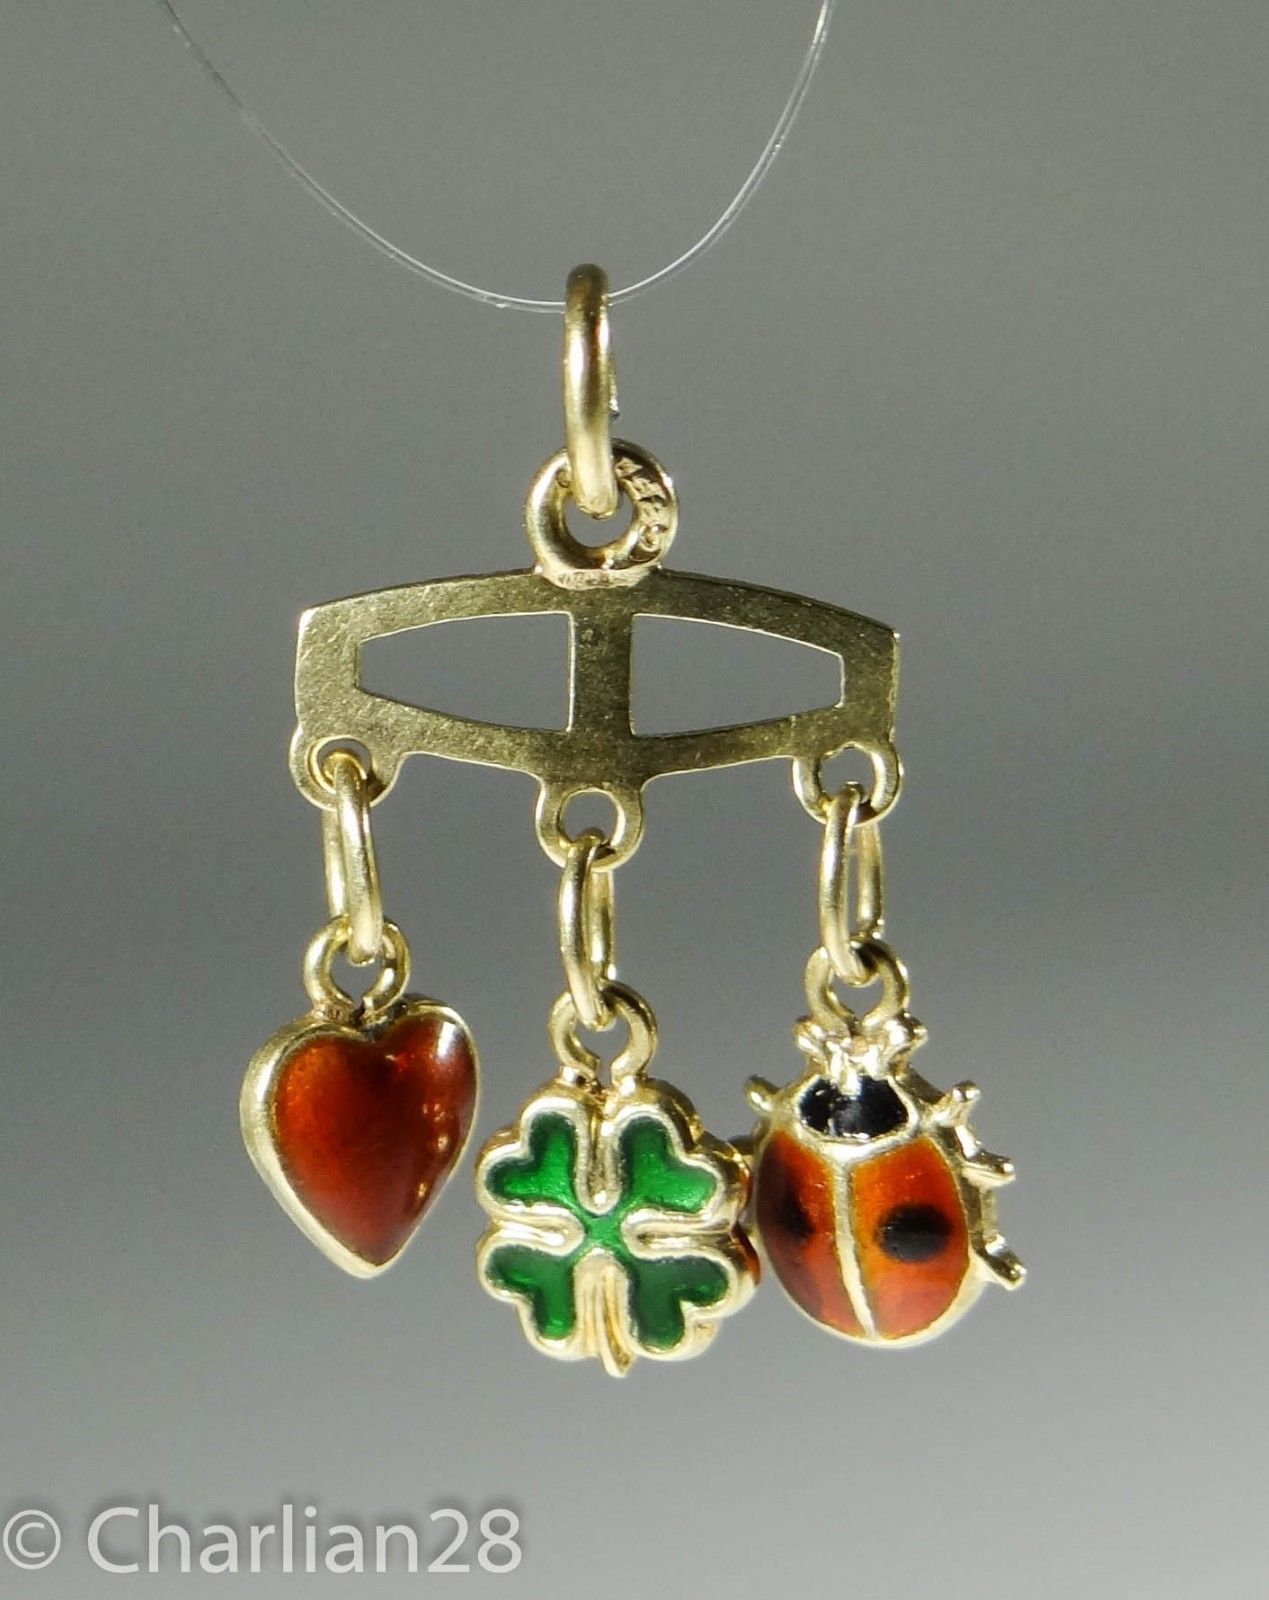 VINTAGE 14KARAT LUCKY GOLD CHARM HEART CLOVER LADYBUG GLÜCKSANHÄNGER 585  A1032 | eBay